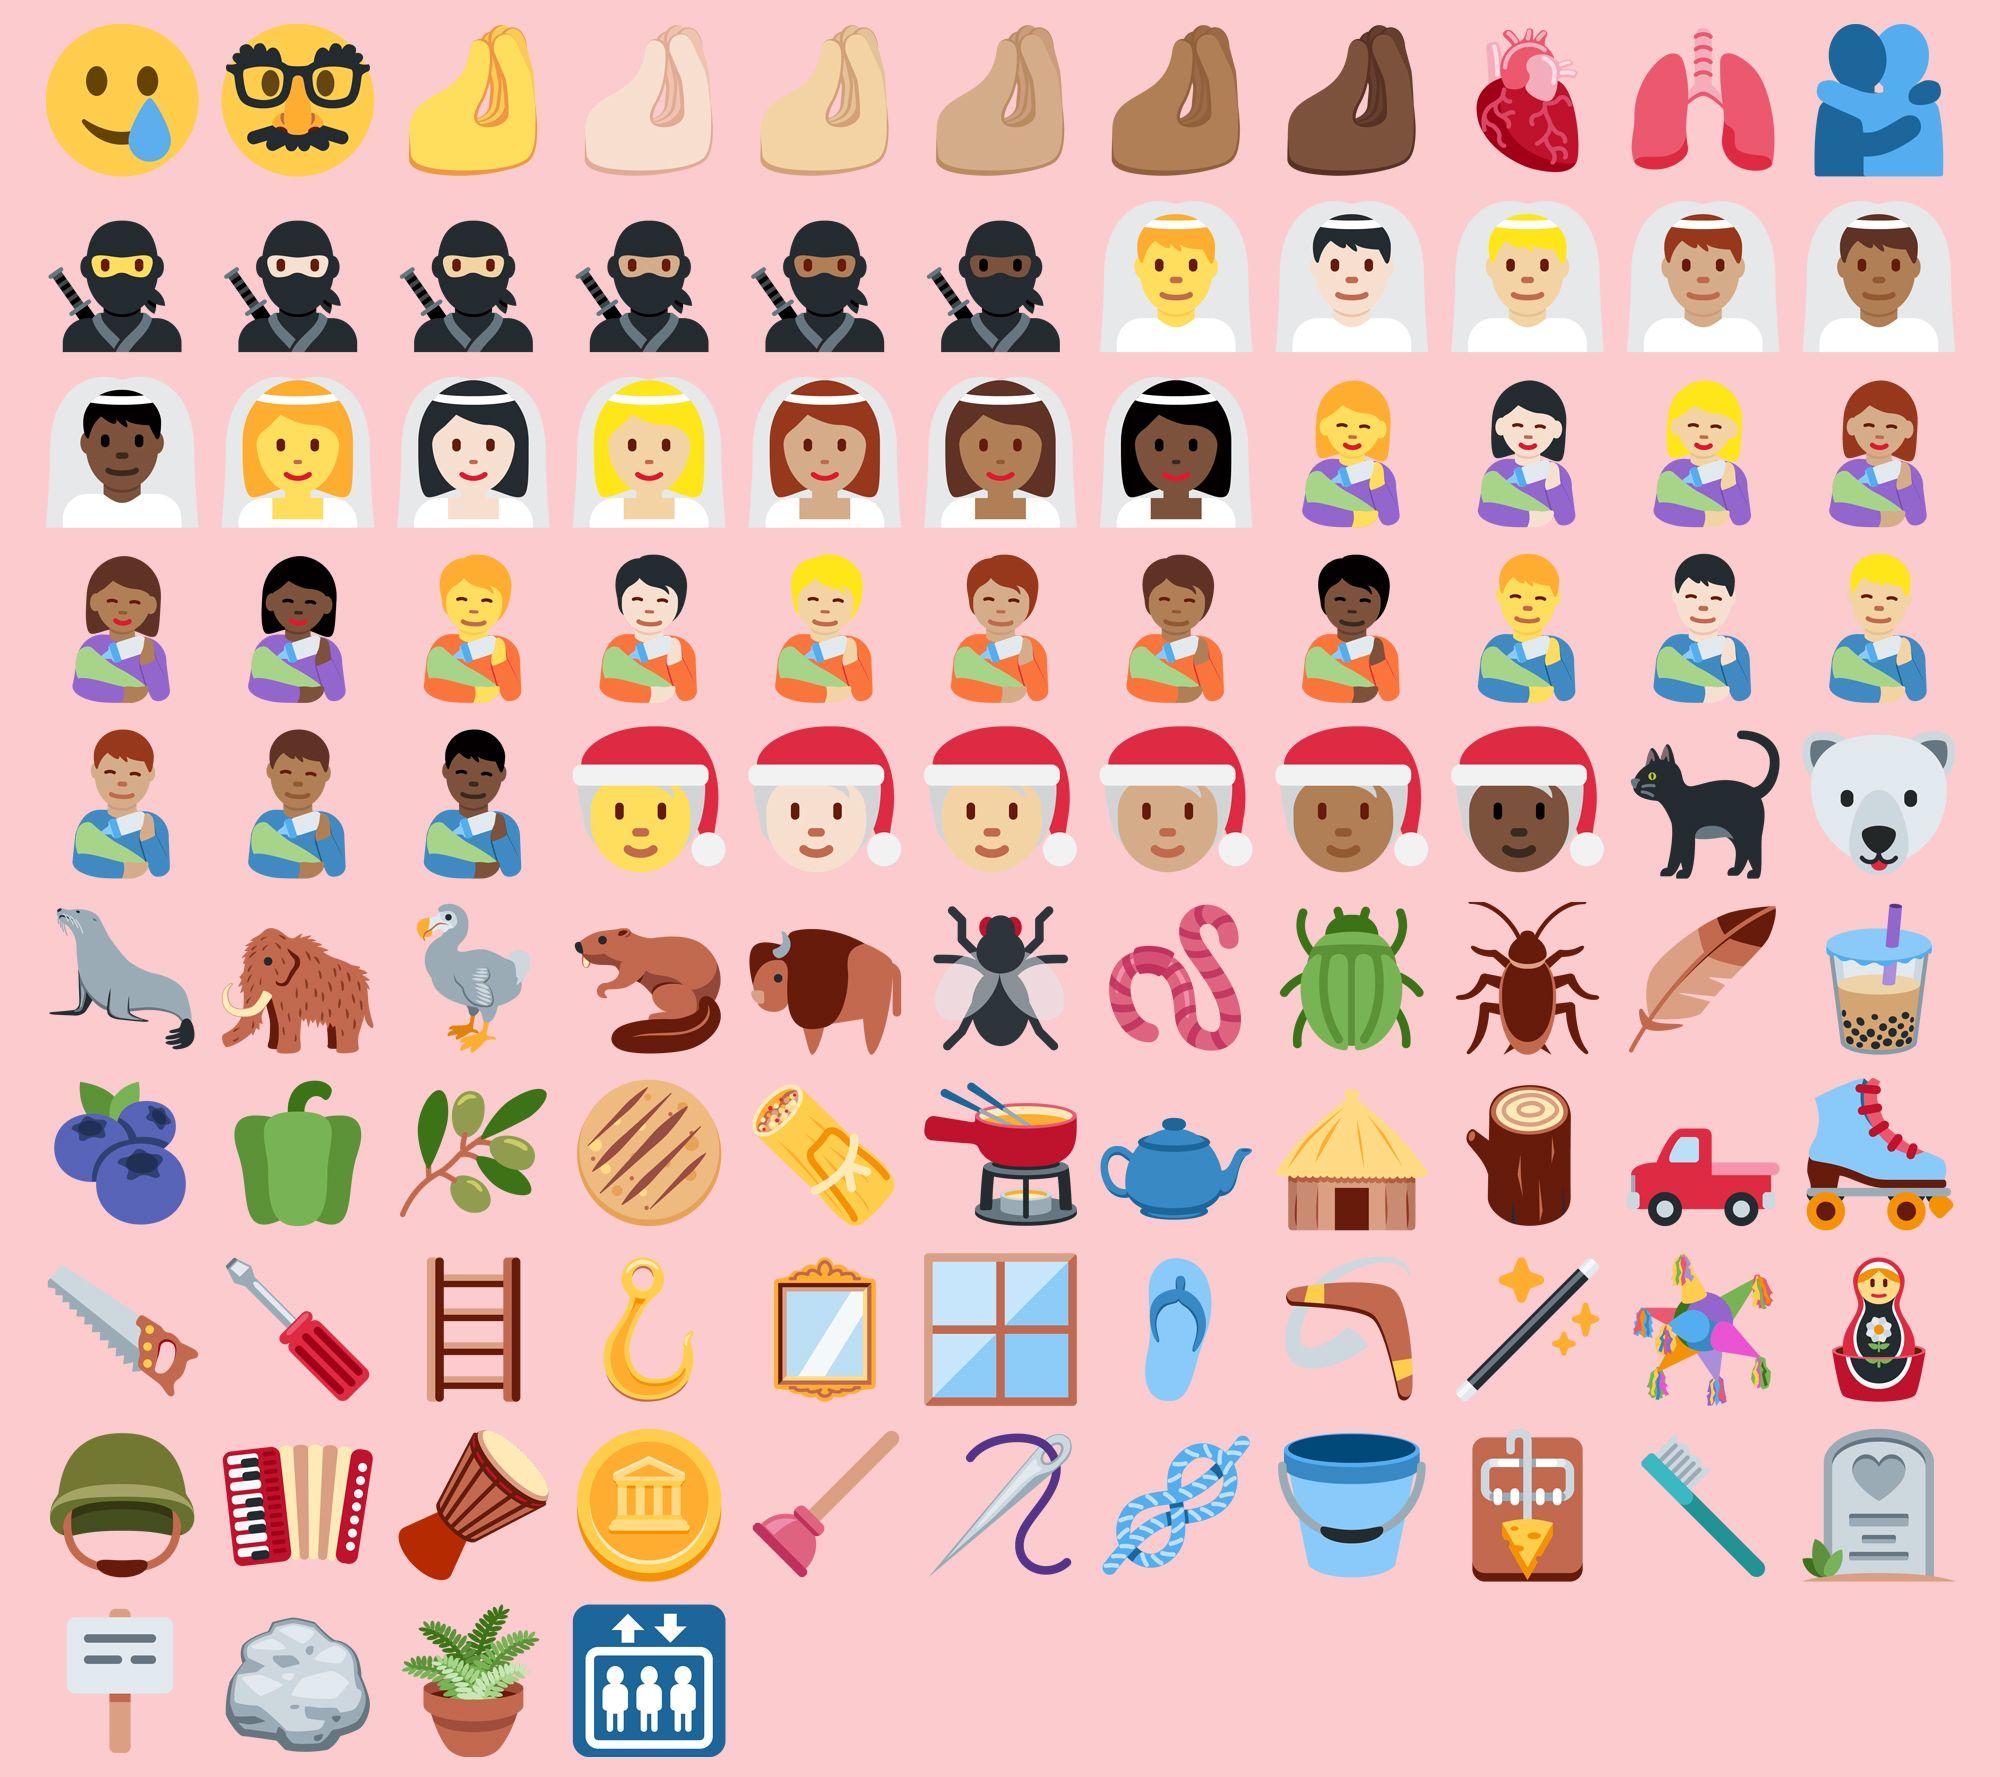 Emojipedia-Twemoji-13.0-All-New-Emojis-Image-2